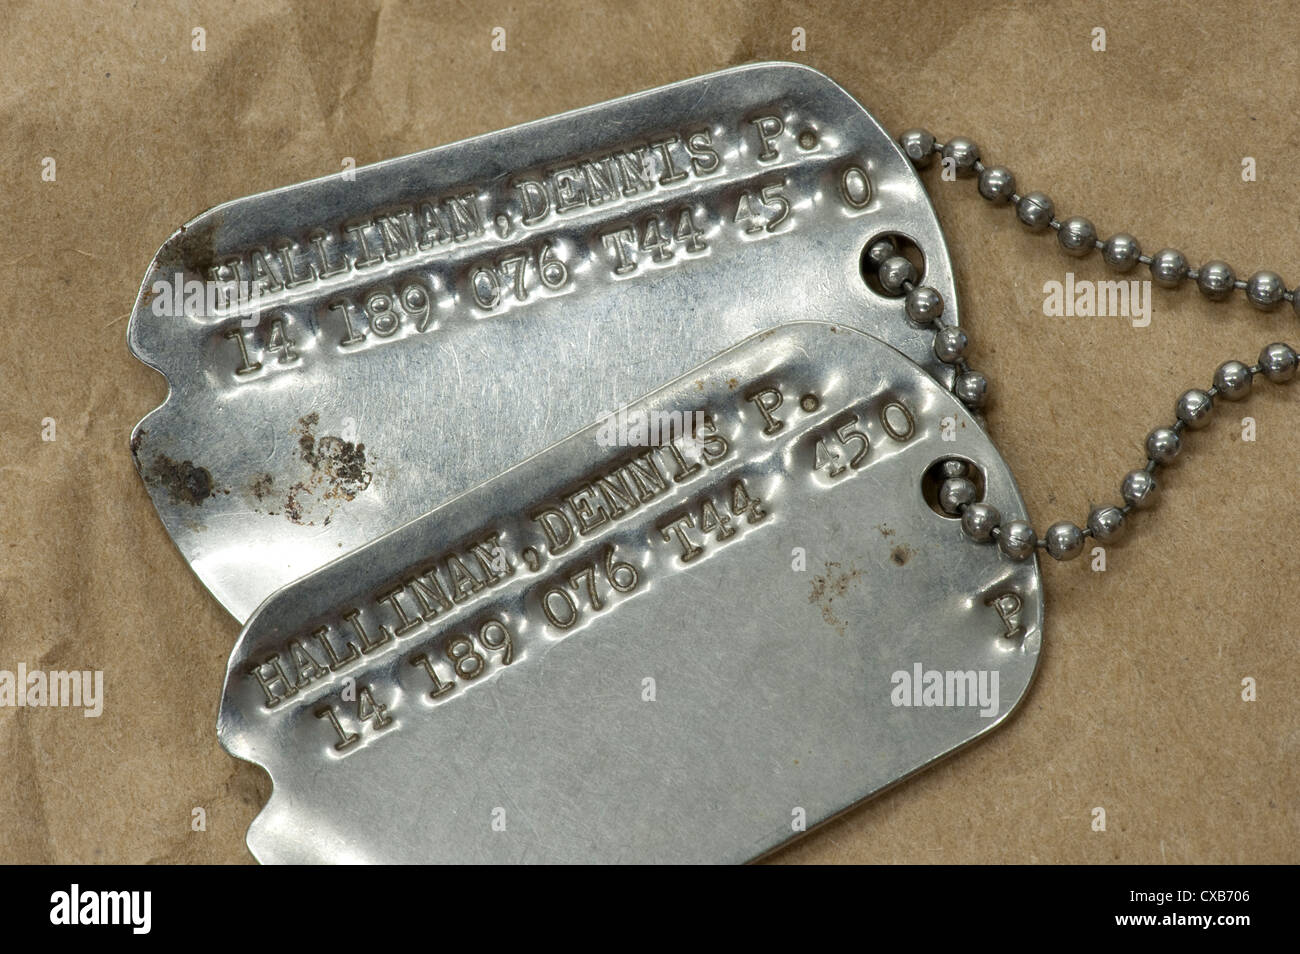 closeup conceptual view of American serviceman dog tags - Stock Image